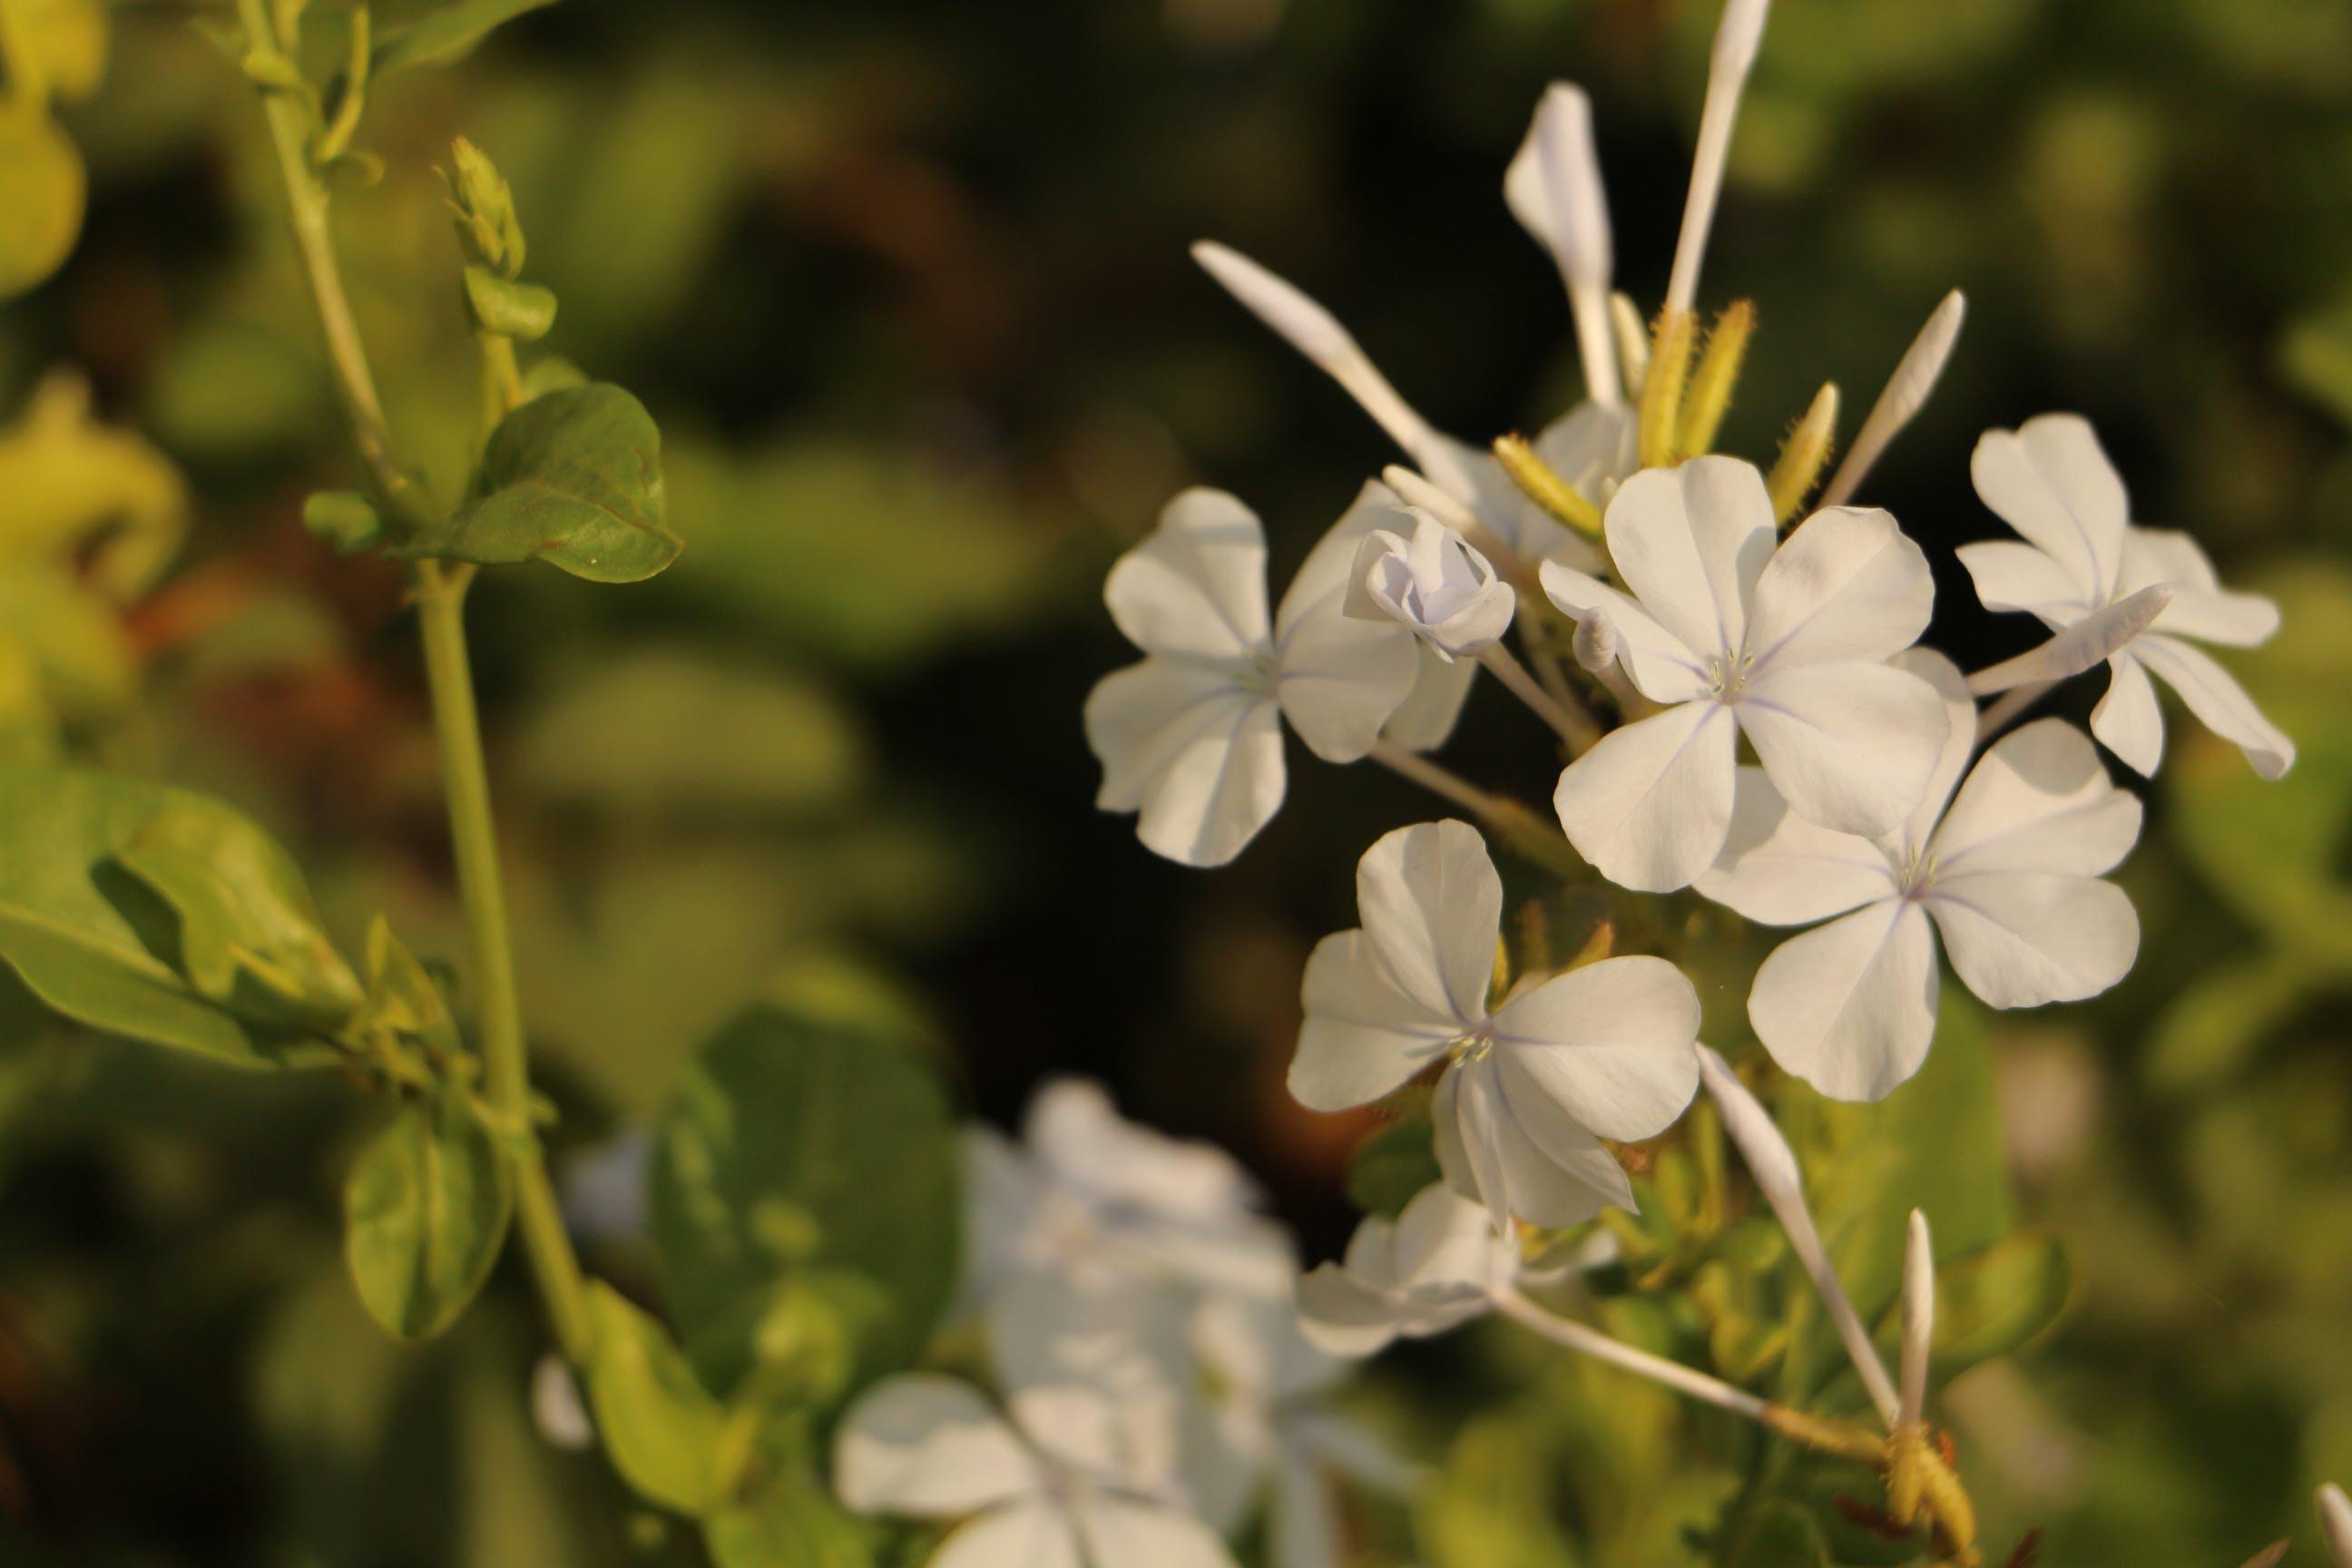 Free stock photo of flowers, white, white flowers, beautiful flowers